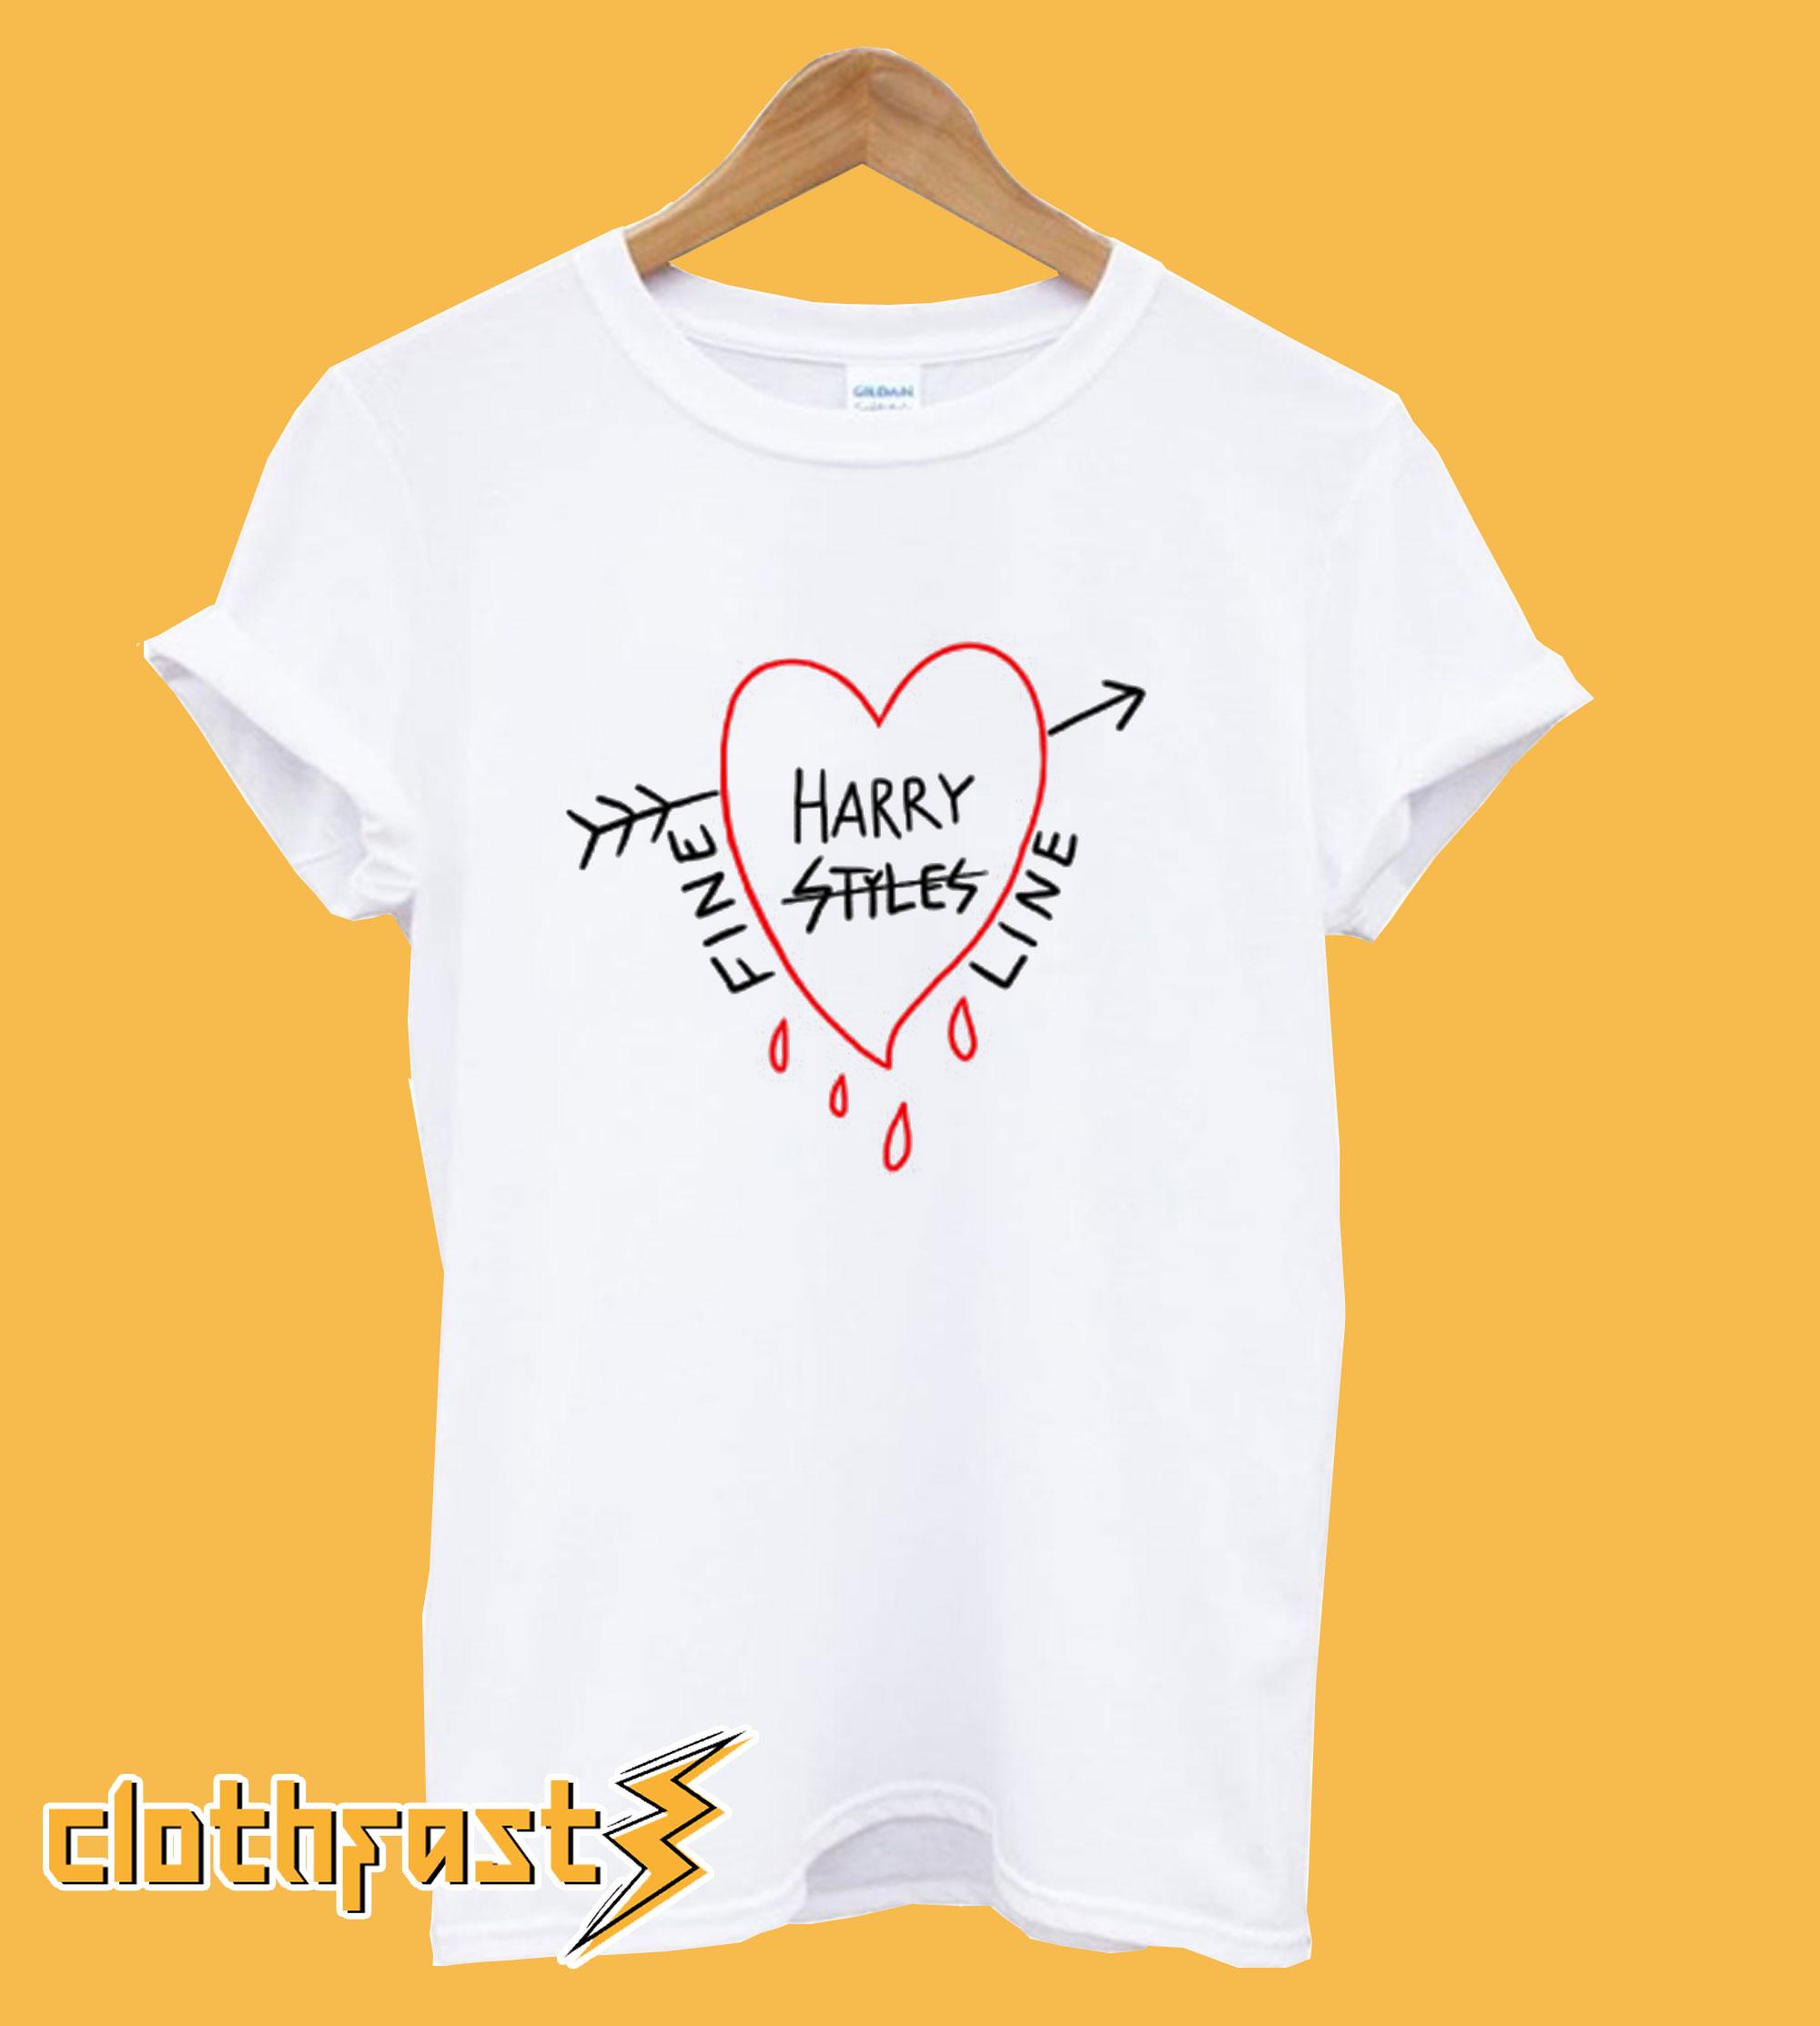 Harry Styles + Alessandro Michele - Fine Line Tee T-Shirt